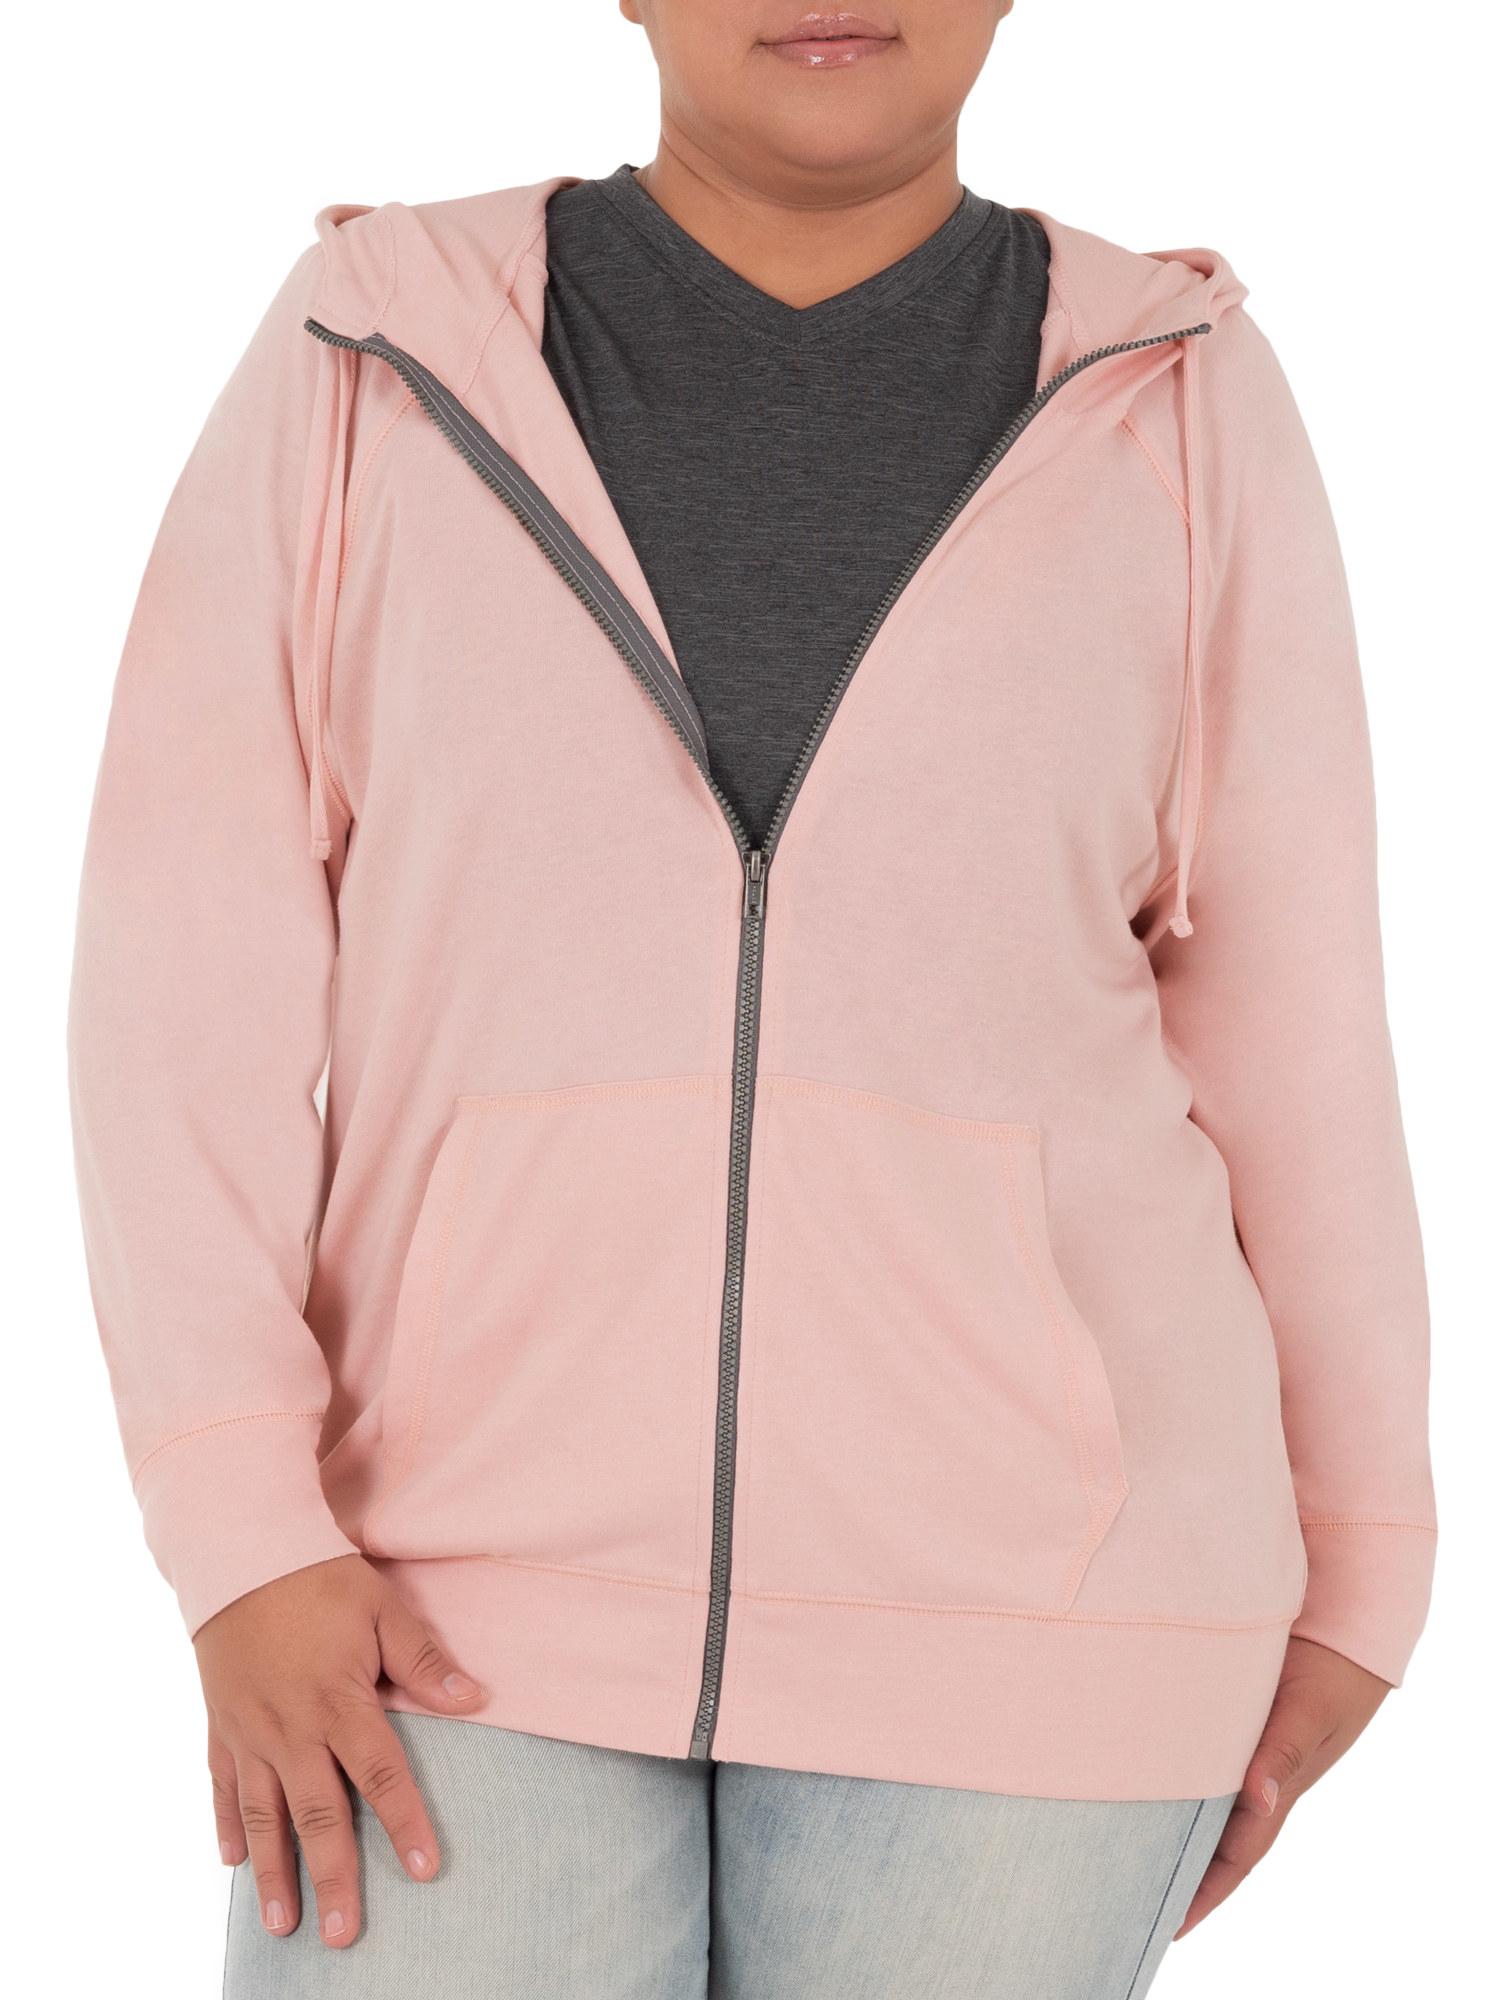 model wearing light pink zip-up hoodie